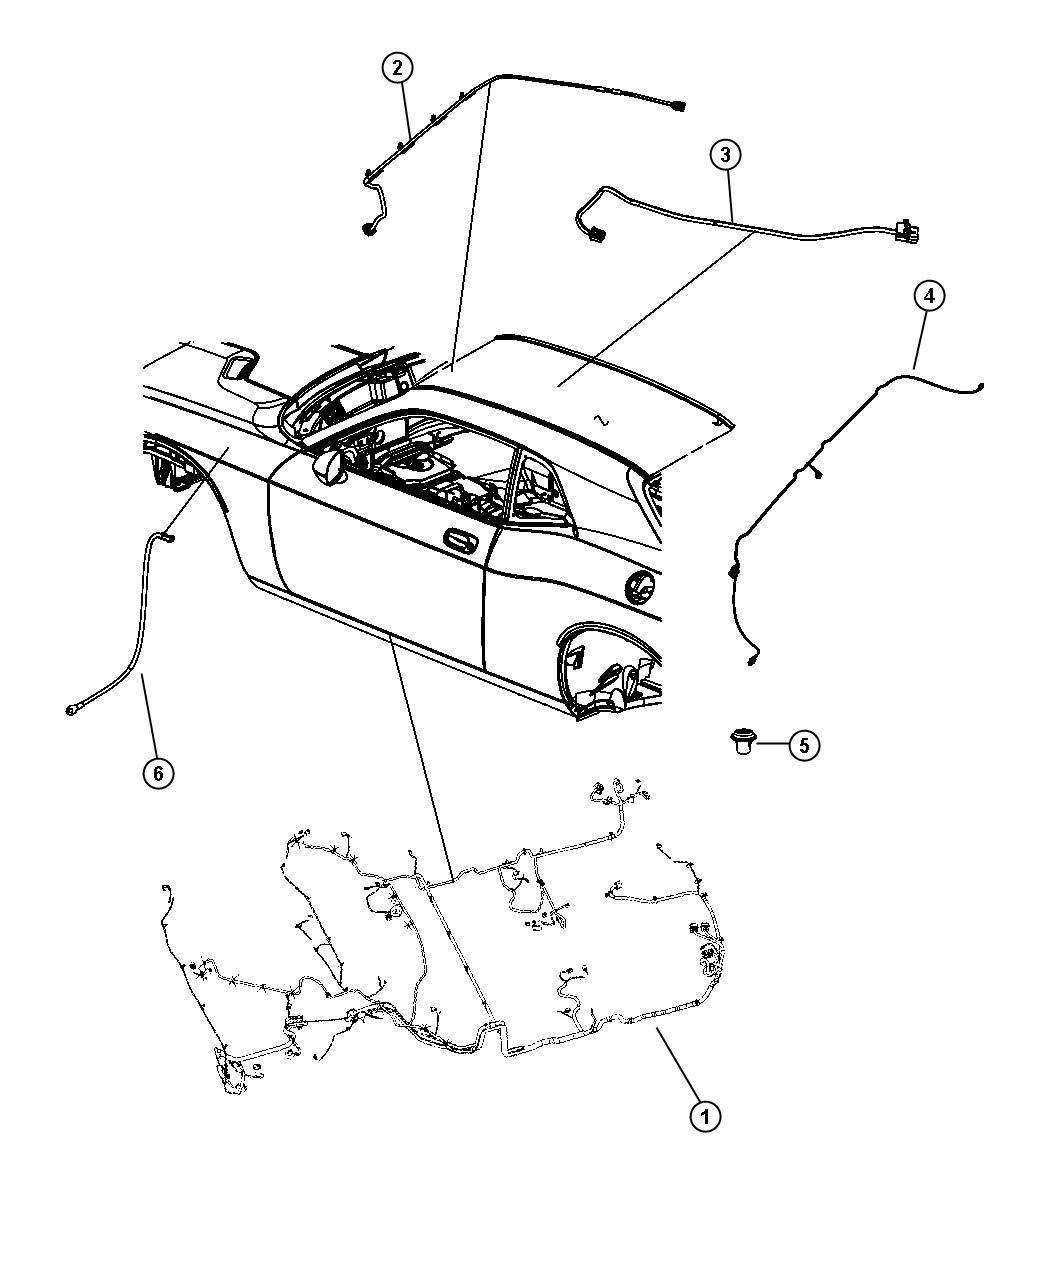 2011 Dodge Challenger Wiring. Sunroof. [gwa]. Trim: (*o0